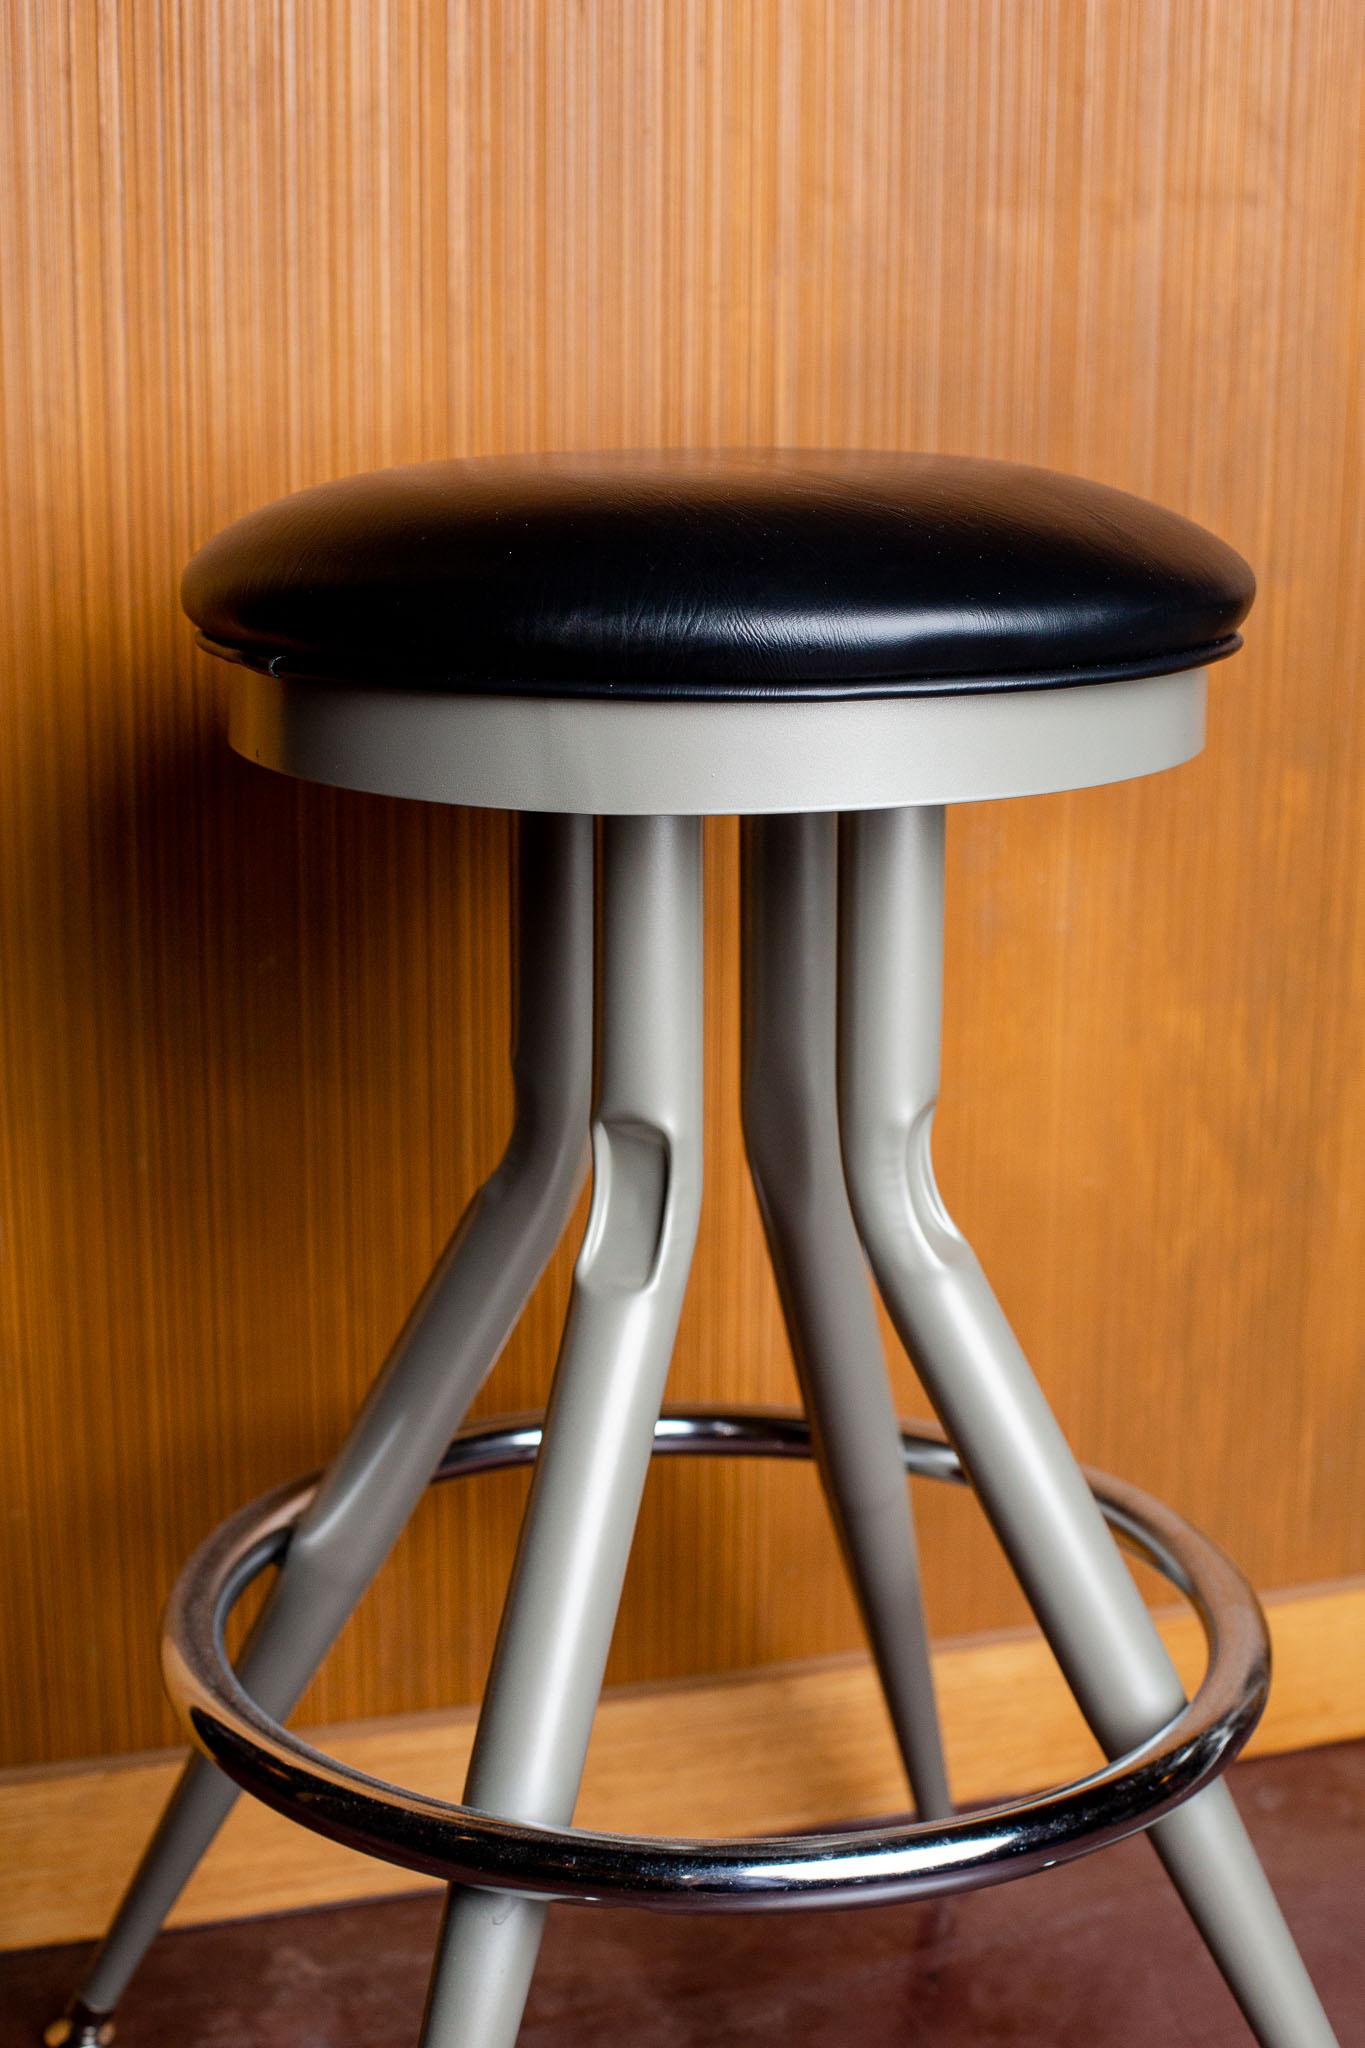 Wallys-bar-stool.jpg